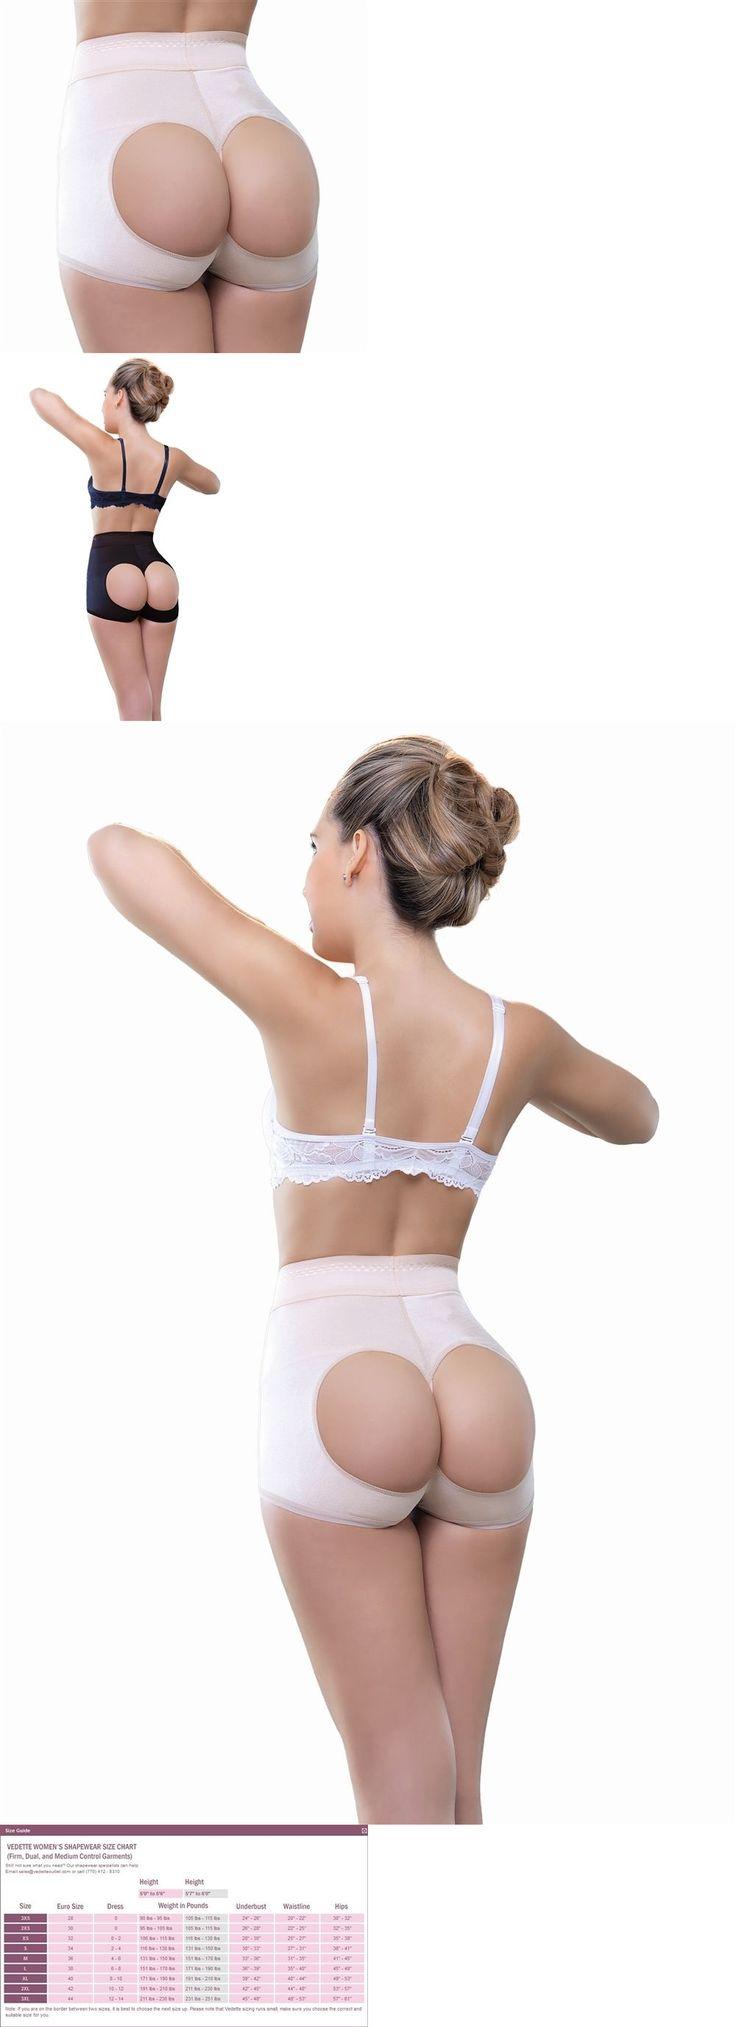 Corsets and Girdles 182051: Vedette 910 Joane High Waist Open Bottom Enhancer - Butt Lifter. -> BUY IT NOW ONLY: $31.99 on eBay!